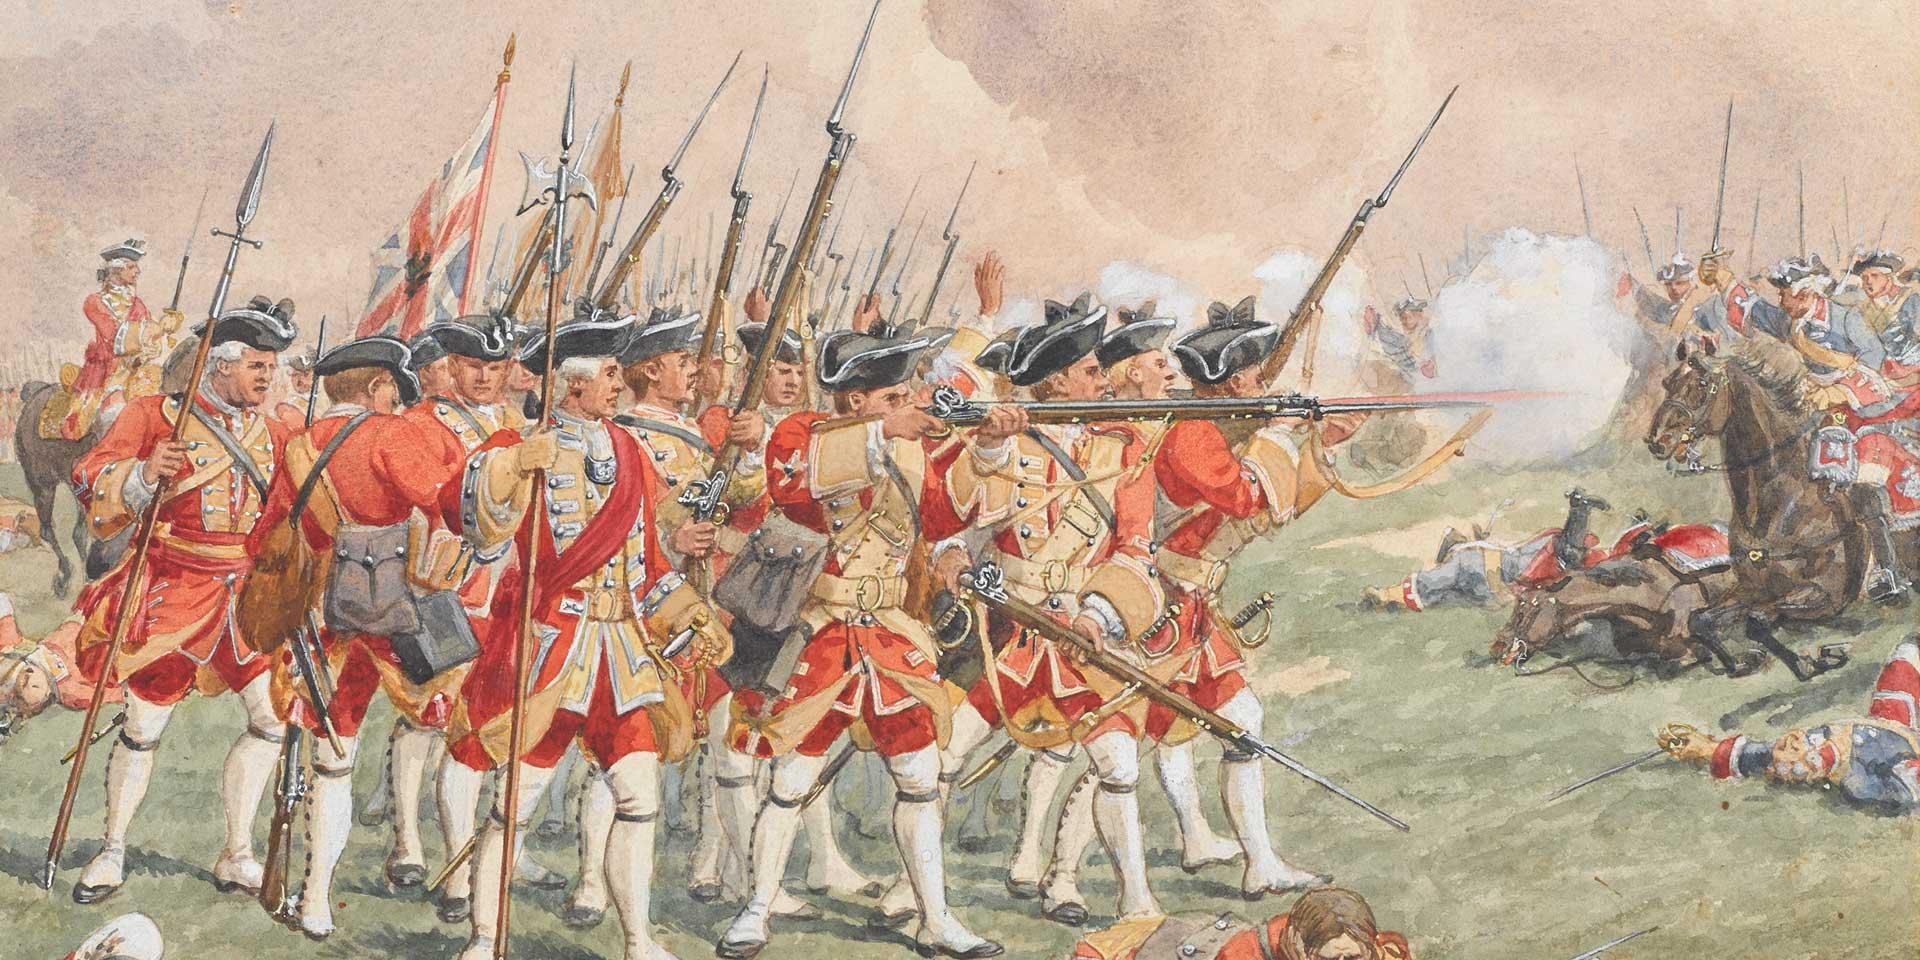 Thomas Howards's Regiment at the Battle of Dettingen, 27 June 1743